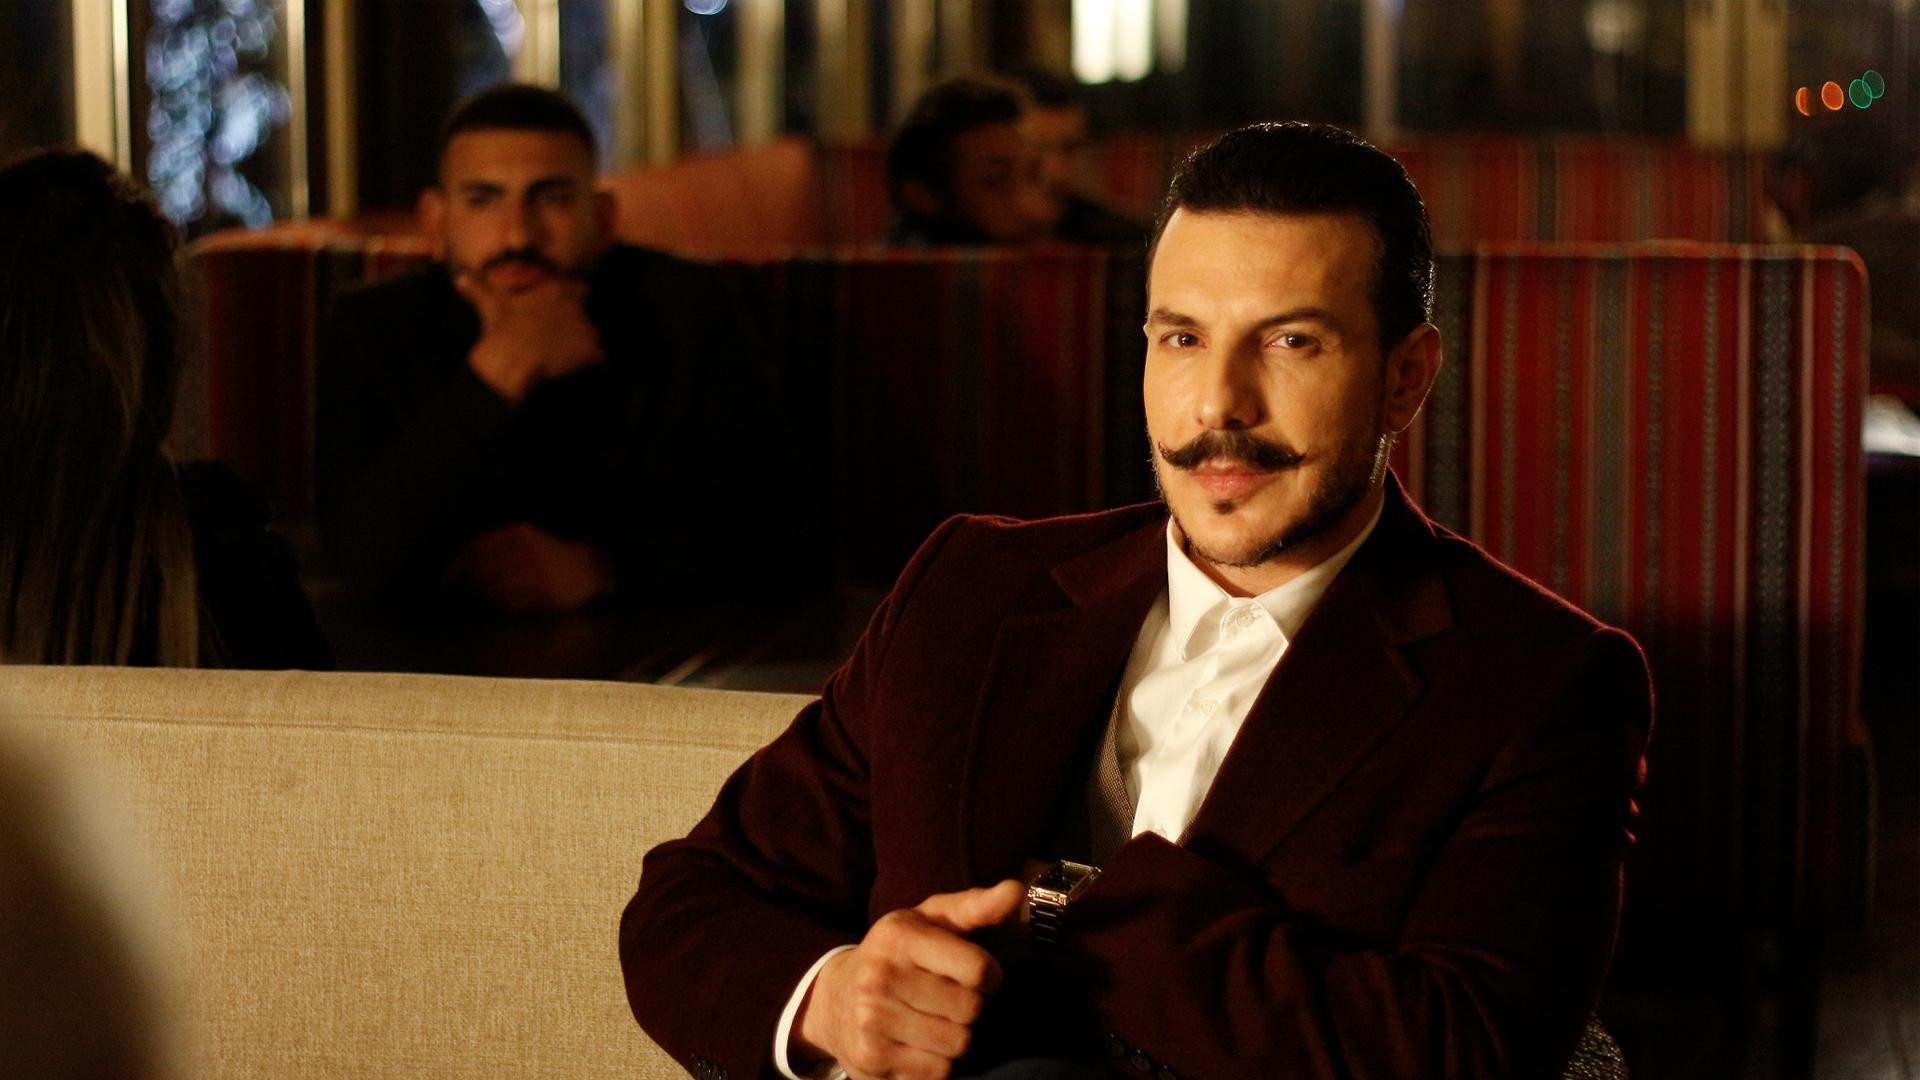 باسل خياط سجين بدون دليل